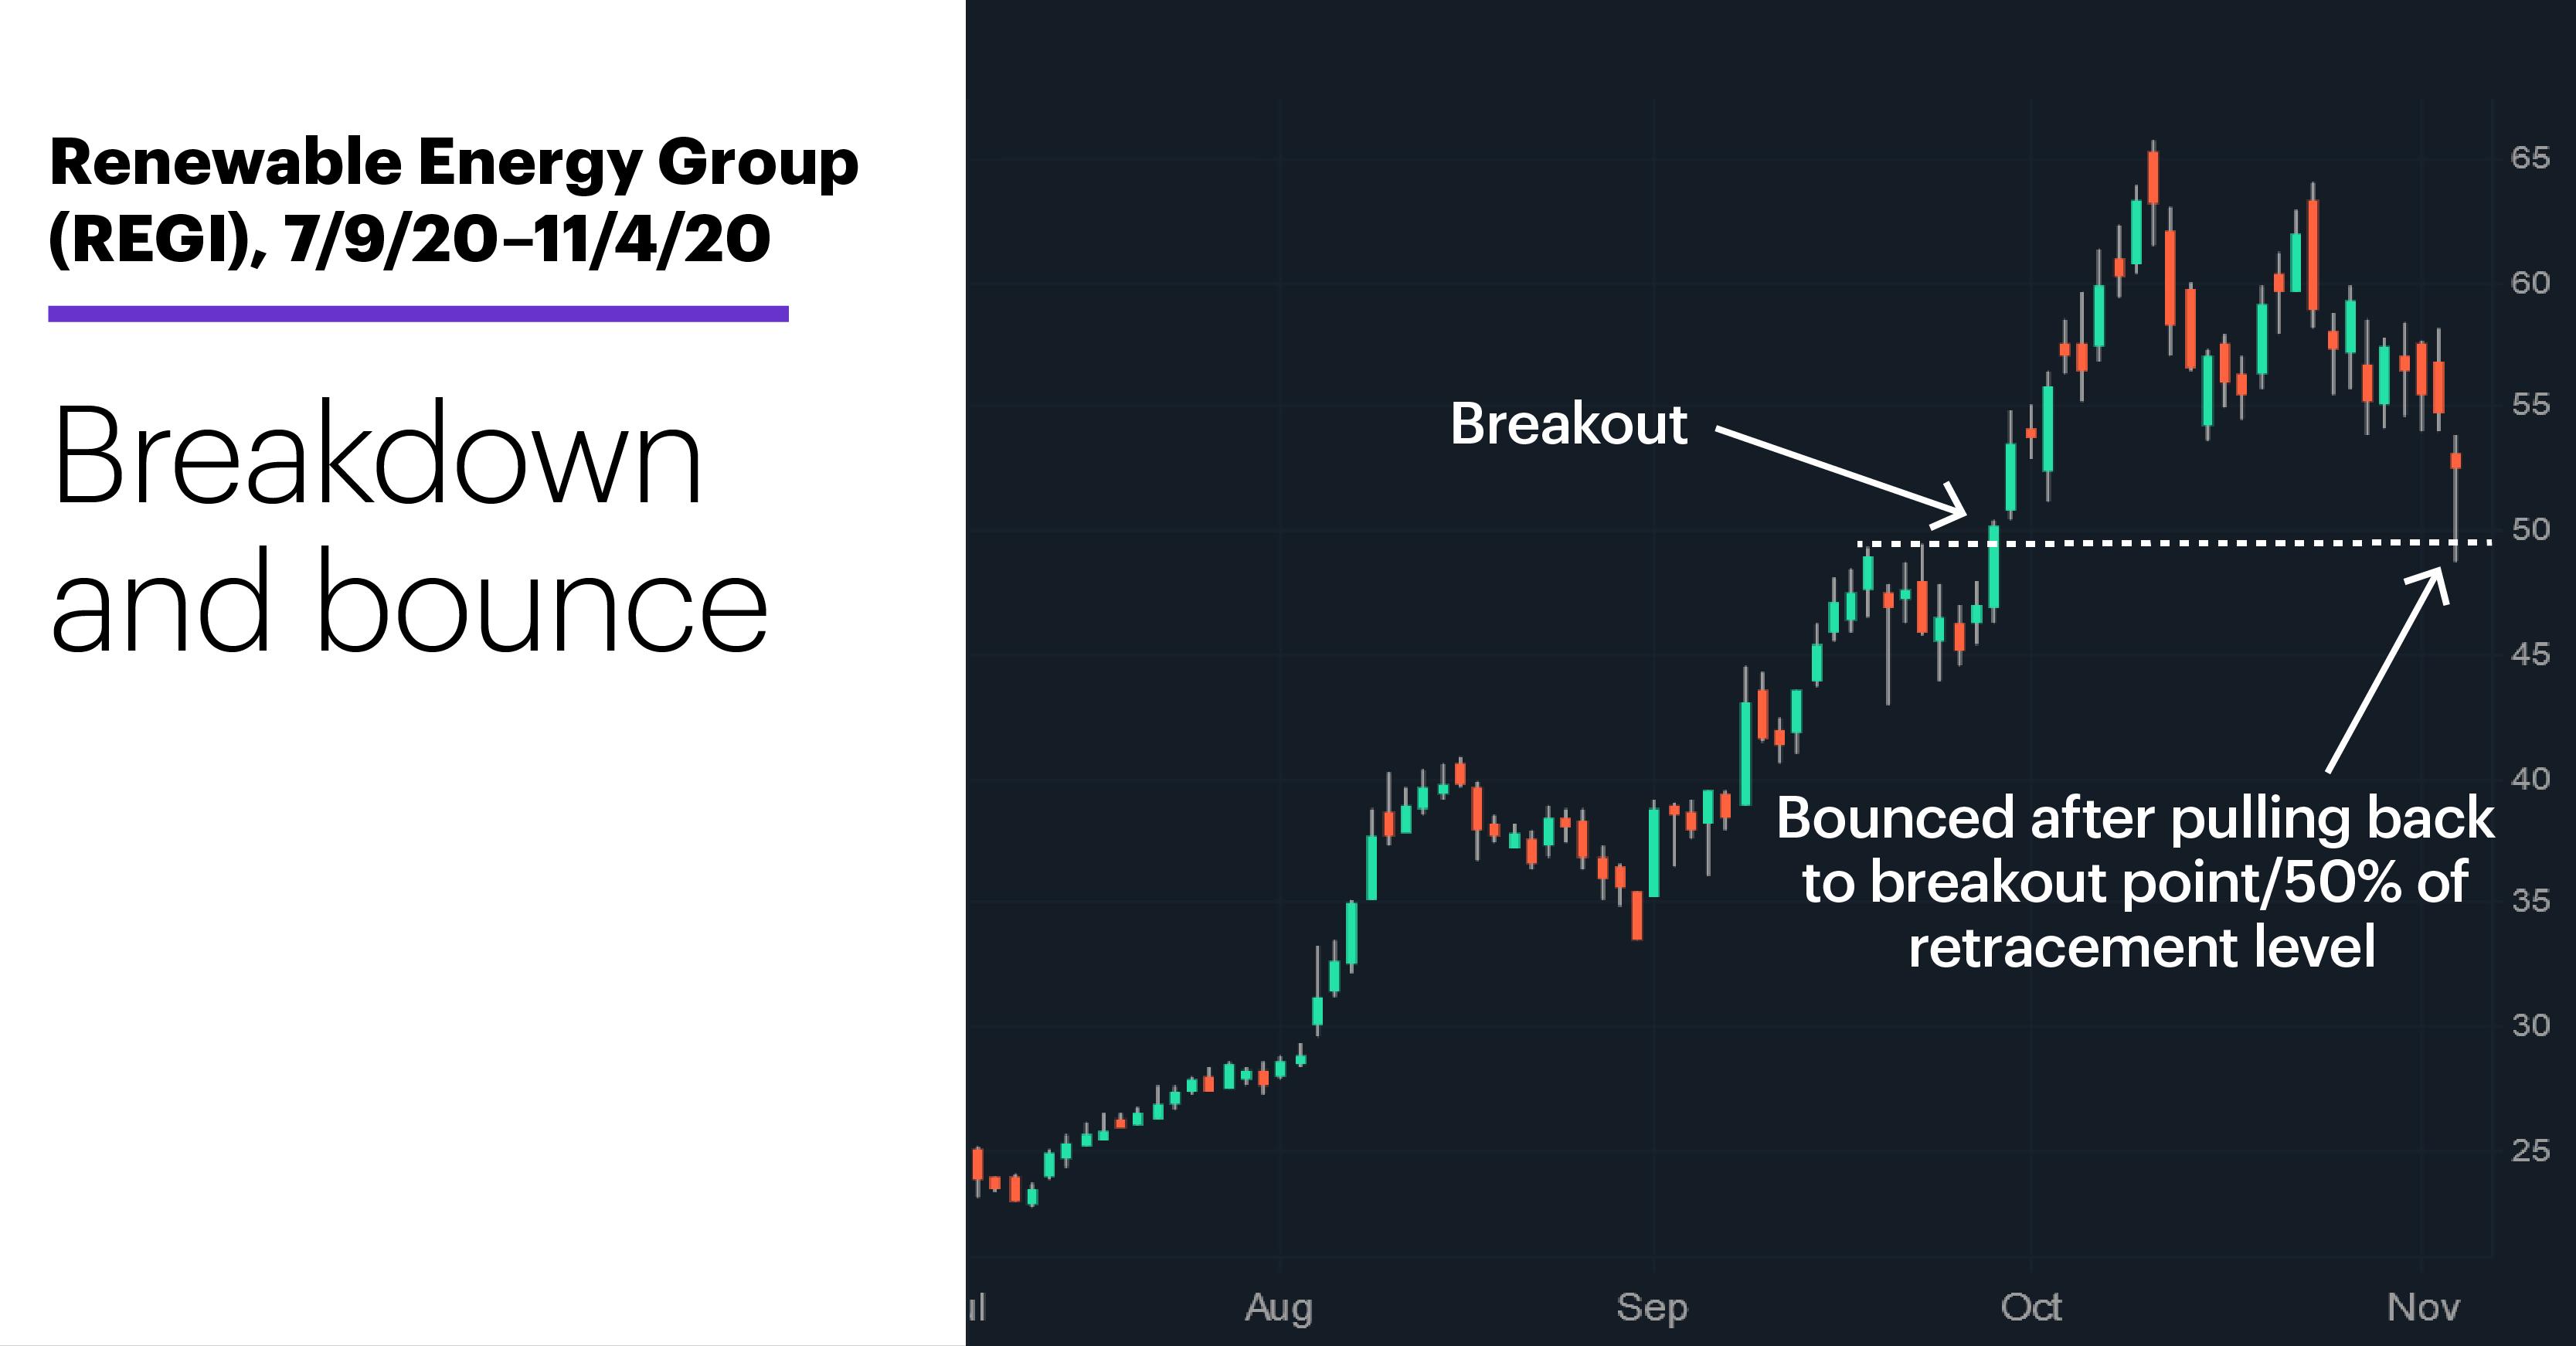 Chart 2: Renewable Energy Group (REGI), 7/9/20–11/4/20. Renewable Energy Group (REGI) price chart. Breakdown and bounce.